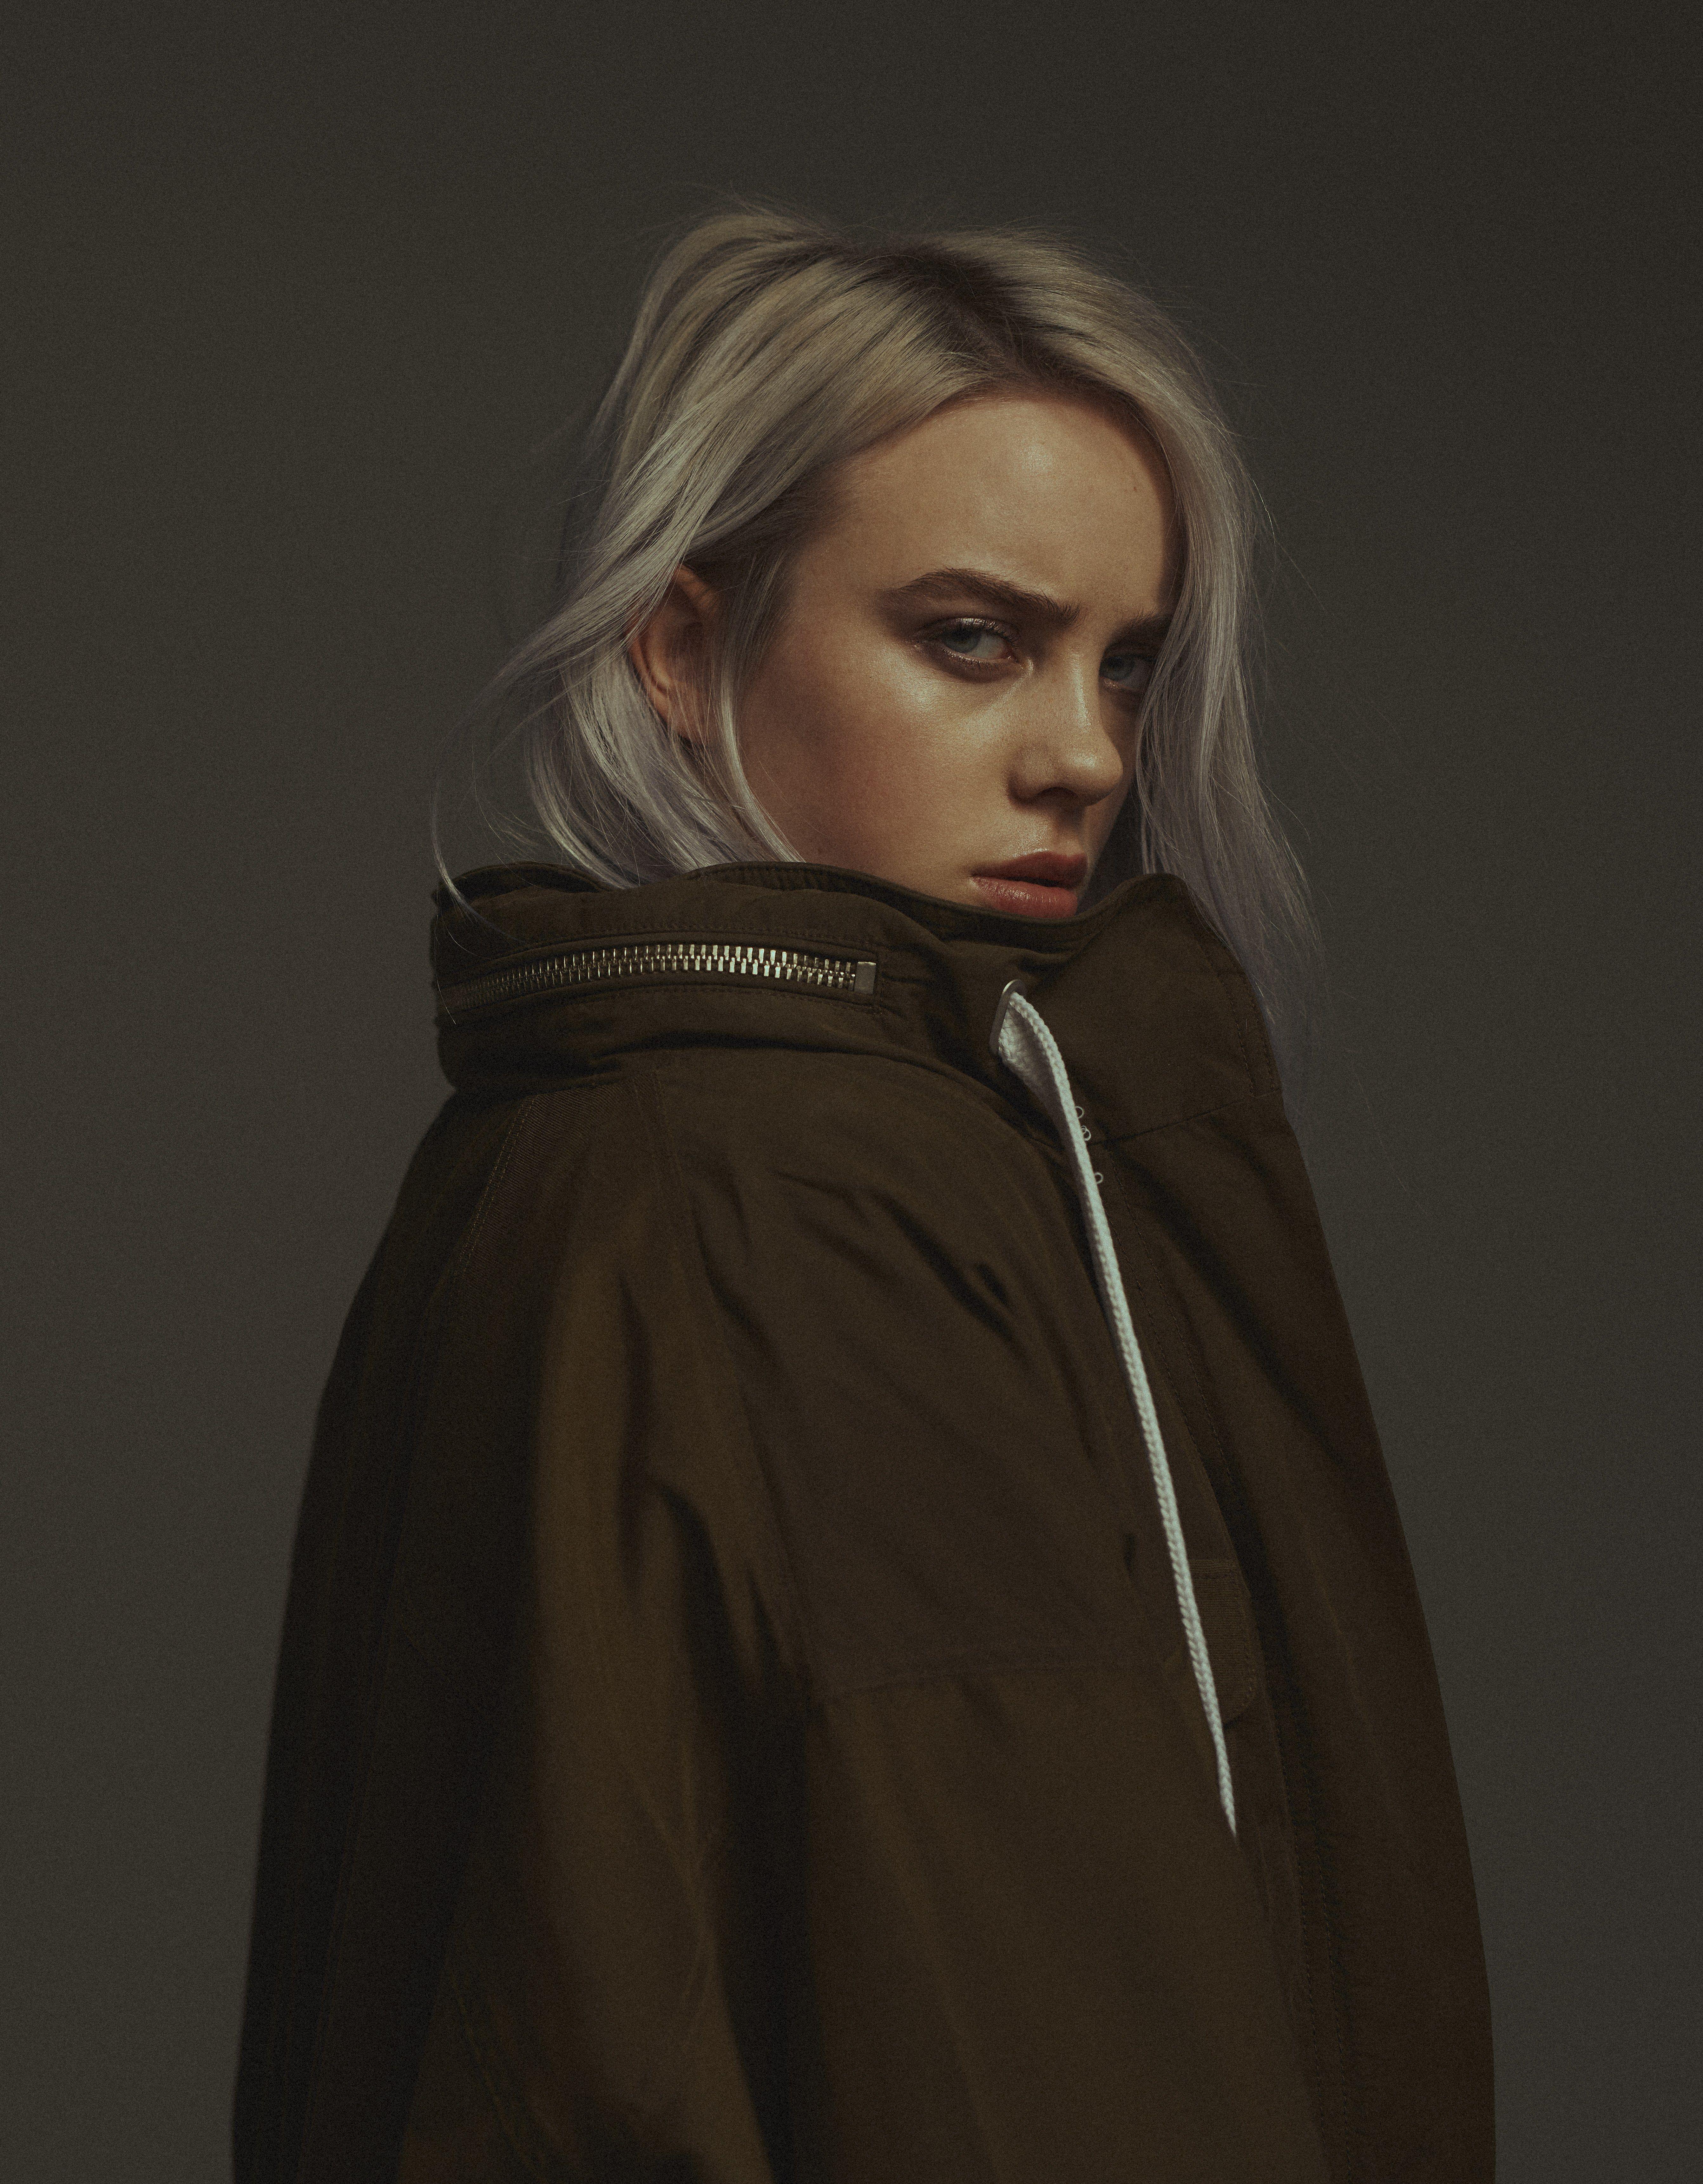 Meet Billie Eilish Pop S Terrifying 15 Year Old Prodigy Billie